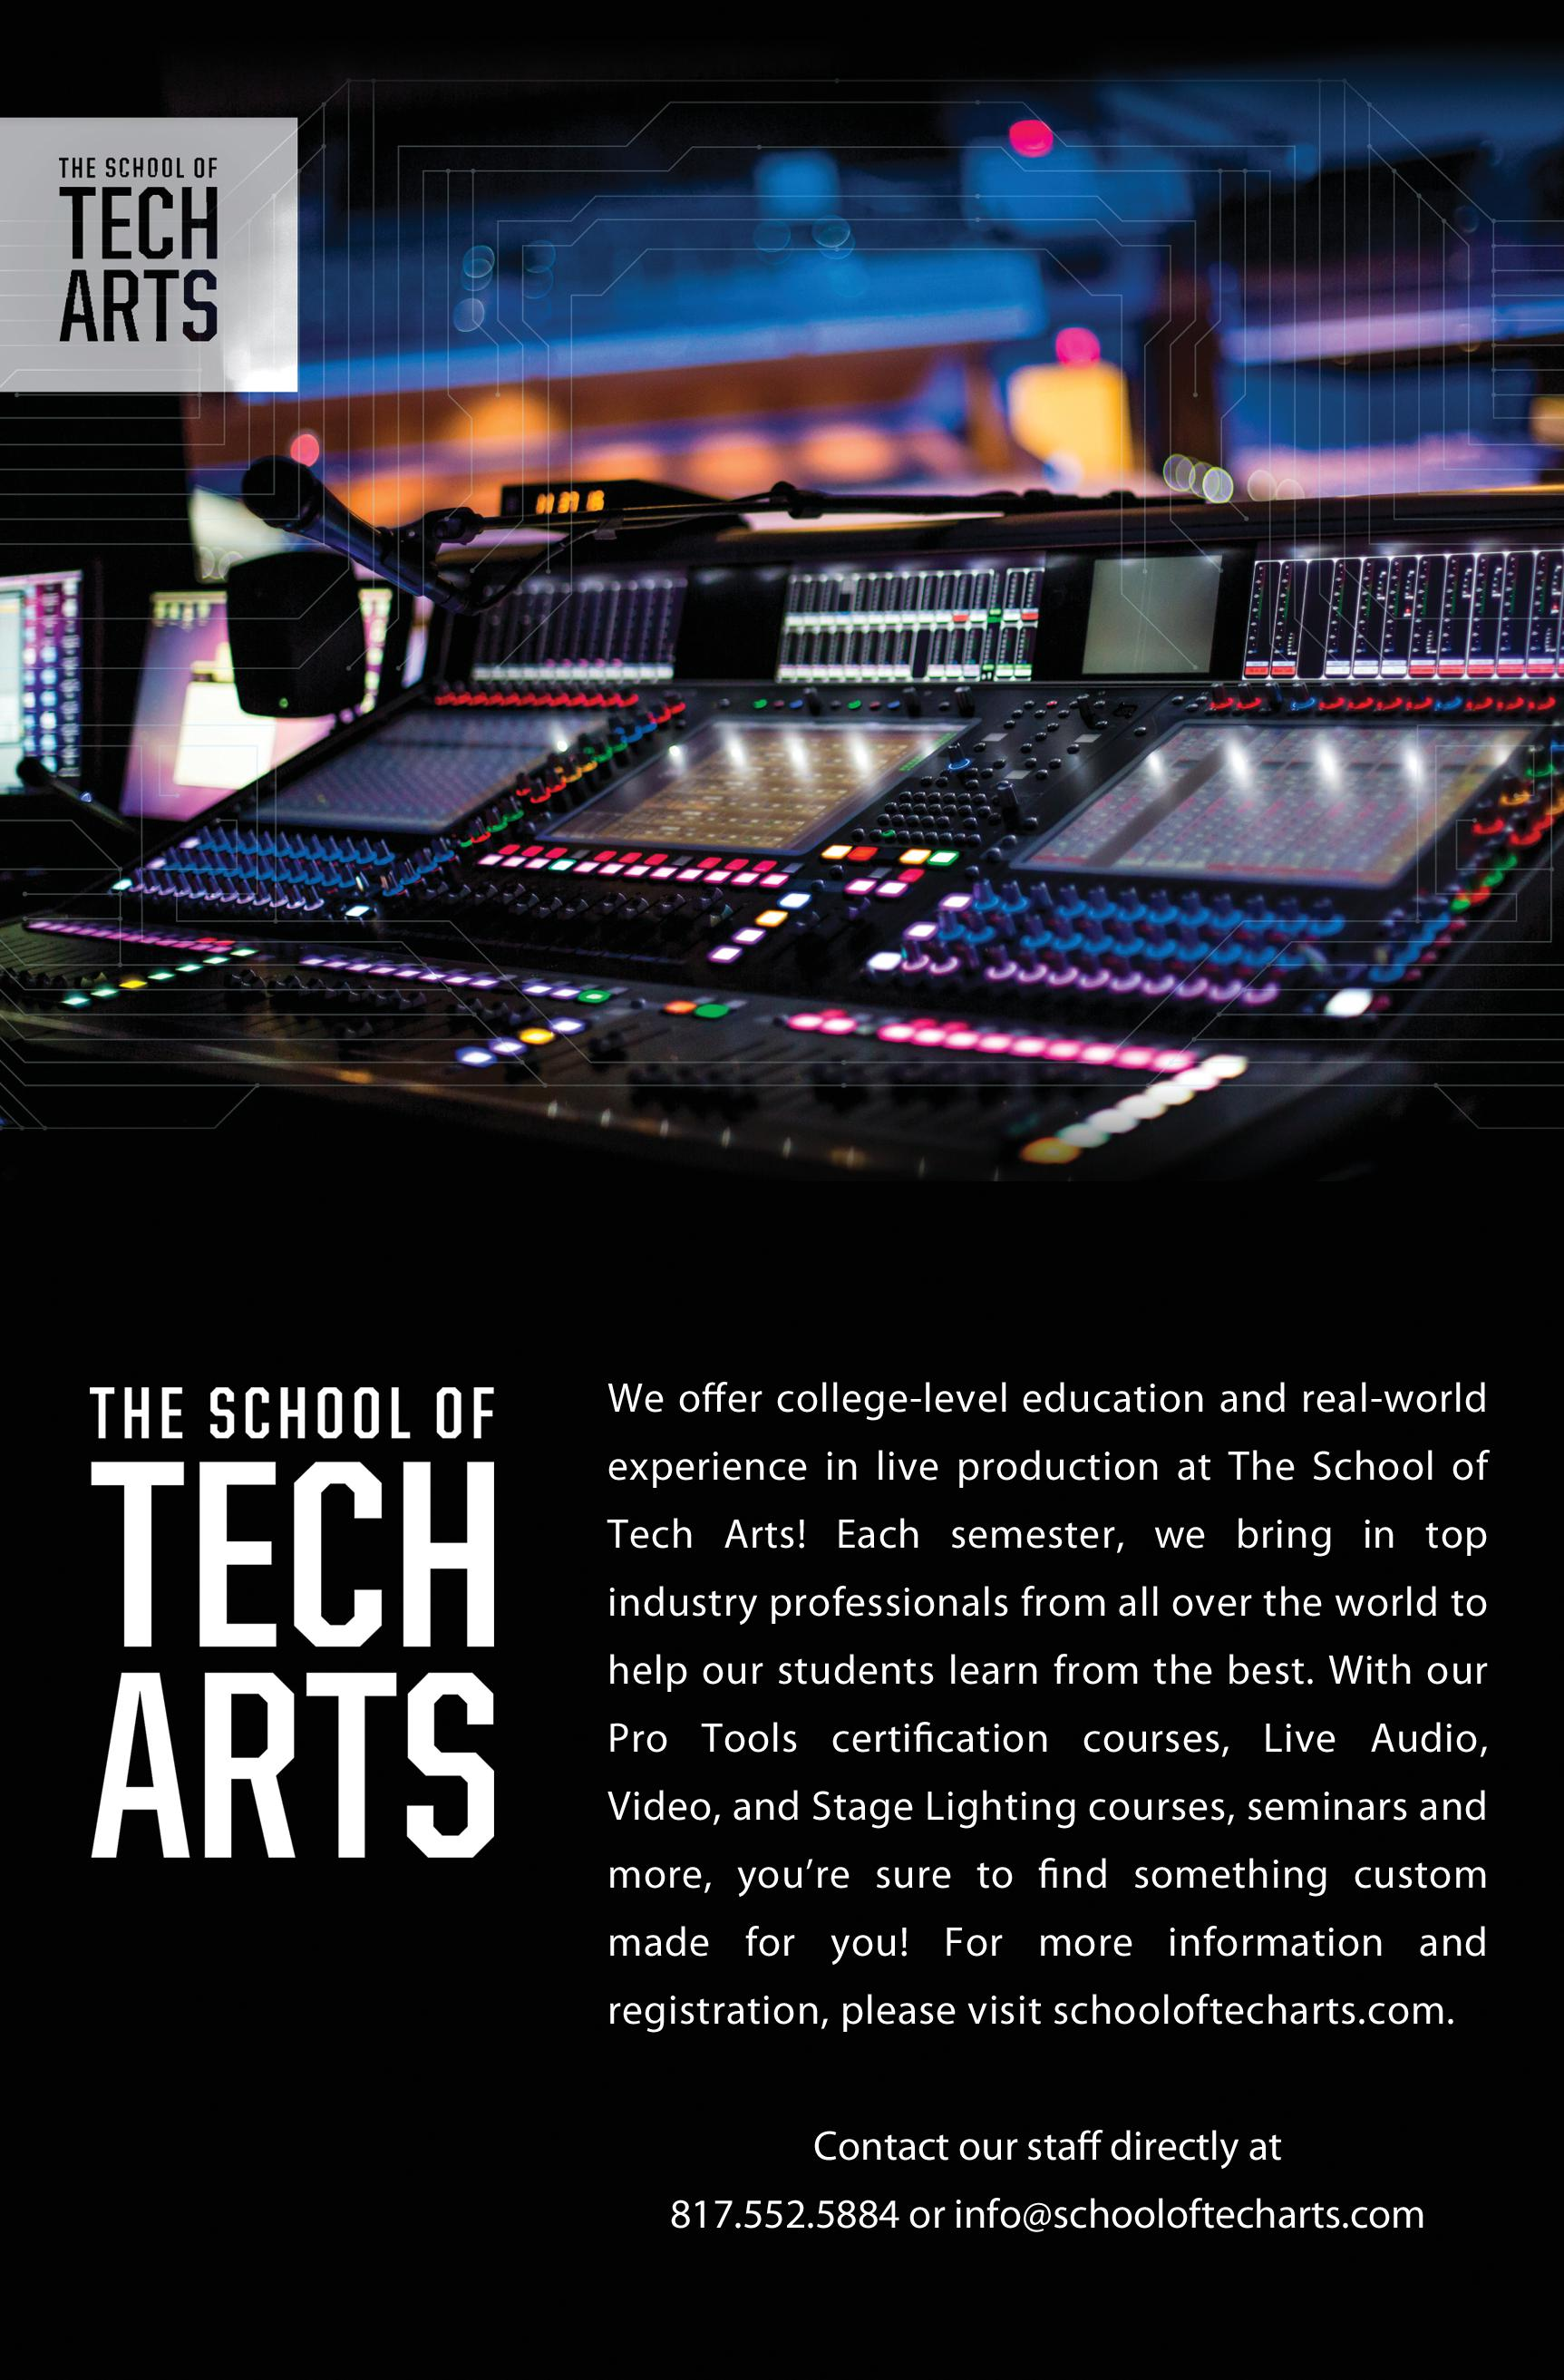 The School of Tech Arts